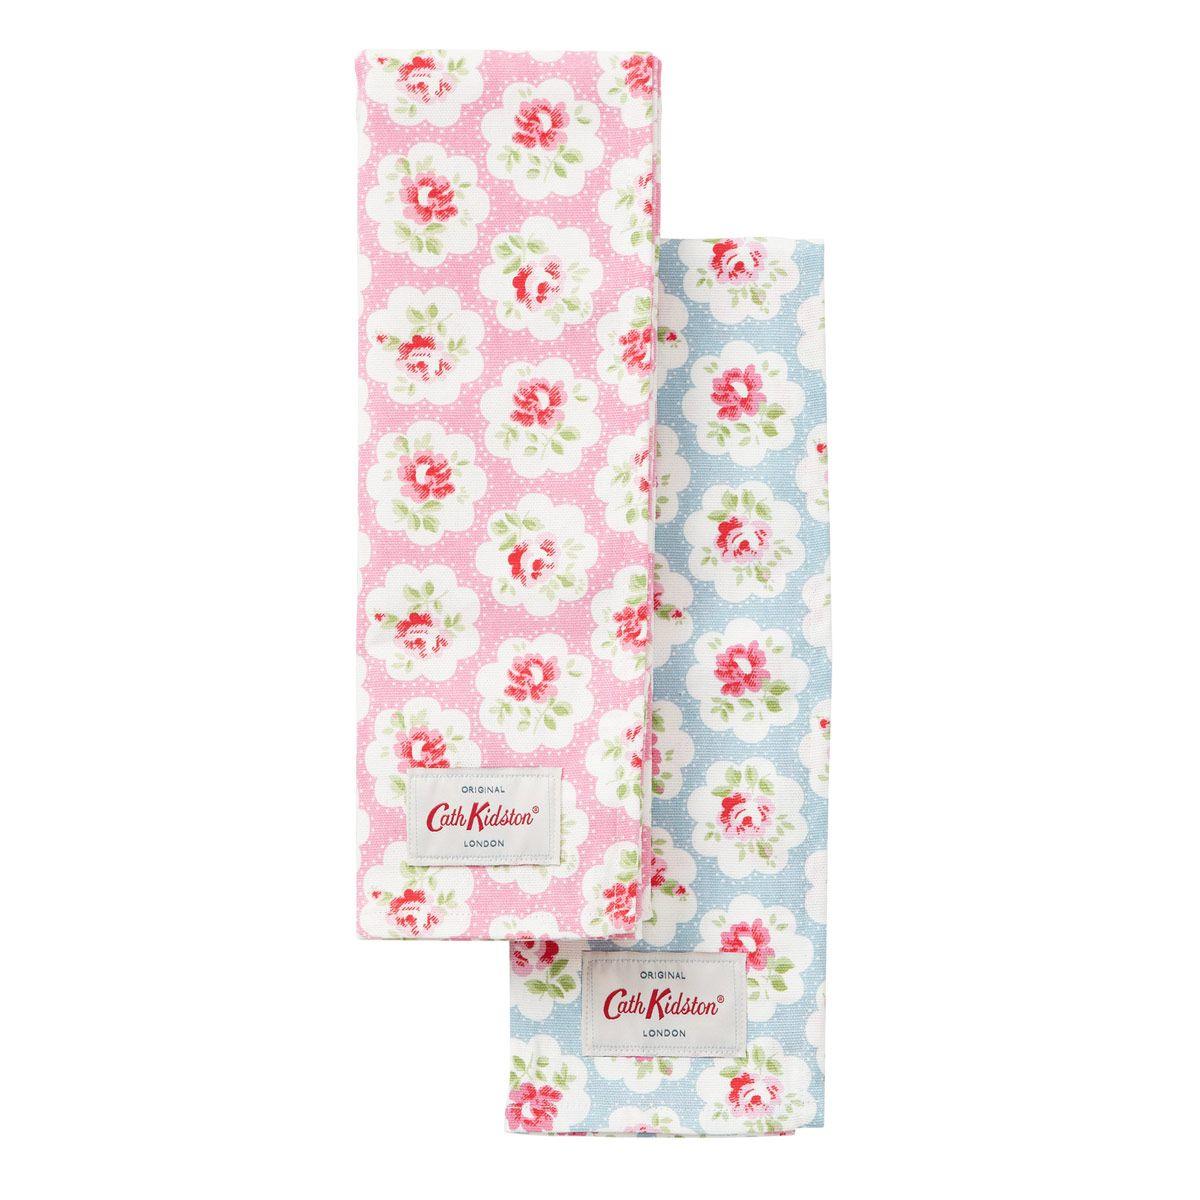 Tea Towels Set Of 2 Provence Rose Cathkidston